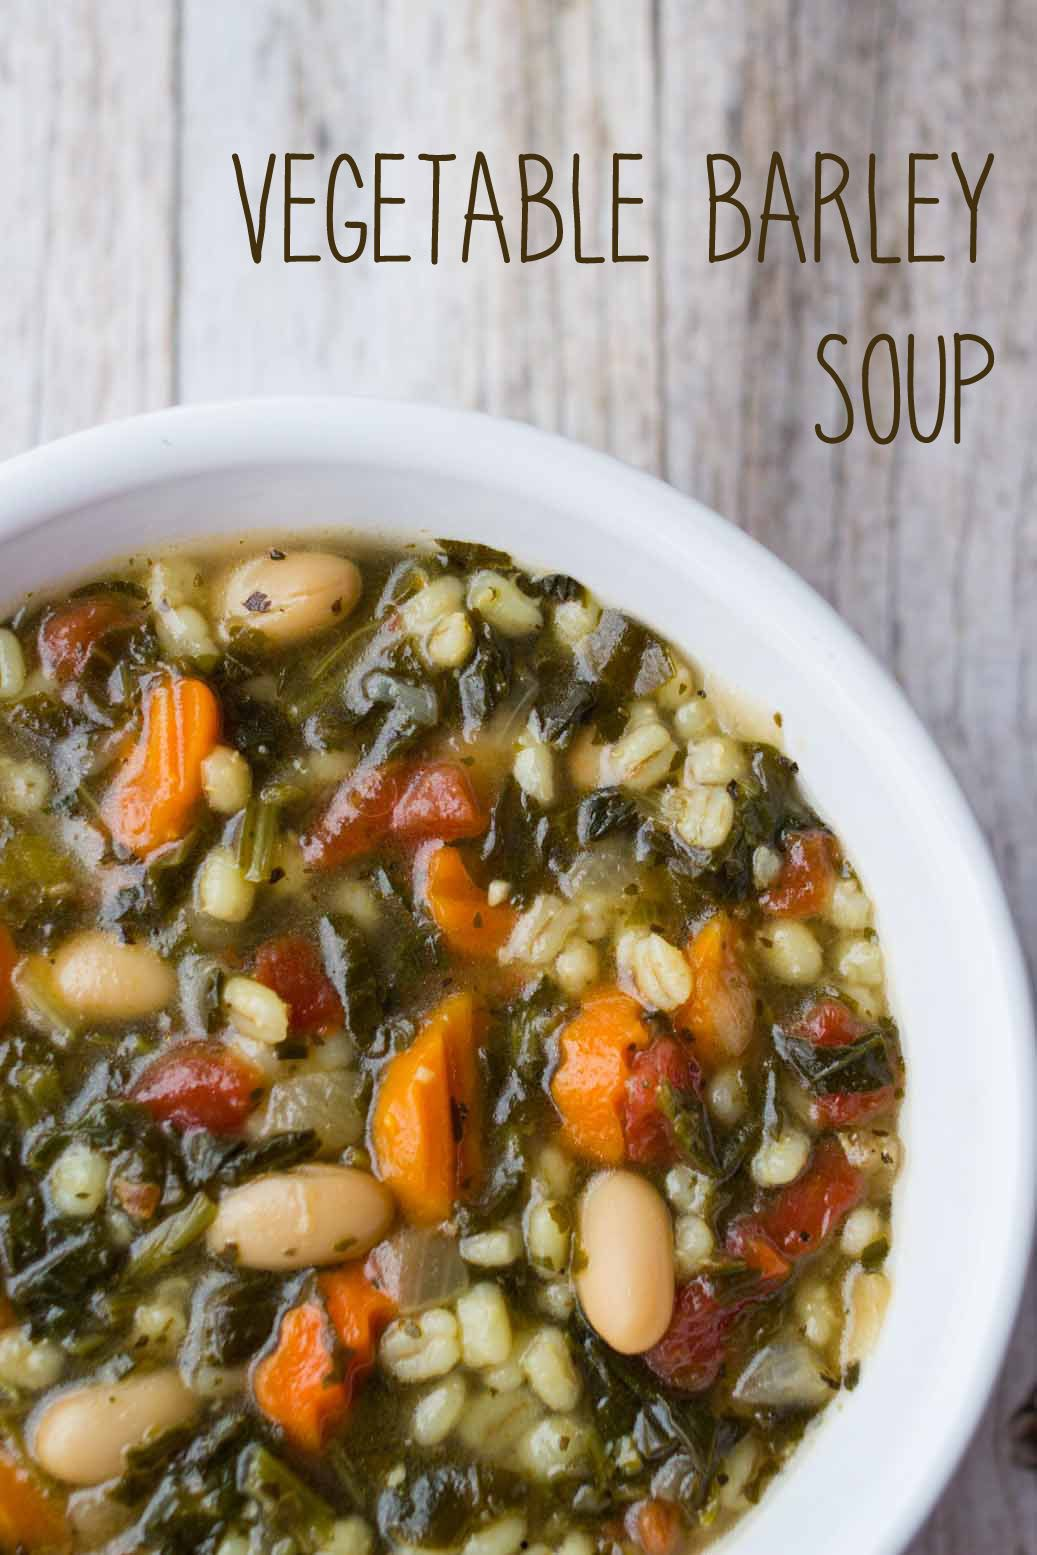 Vegetable Barley Soup Vegetable barley soup, Vegetarian